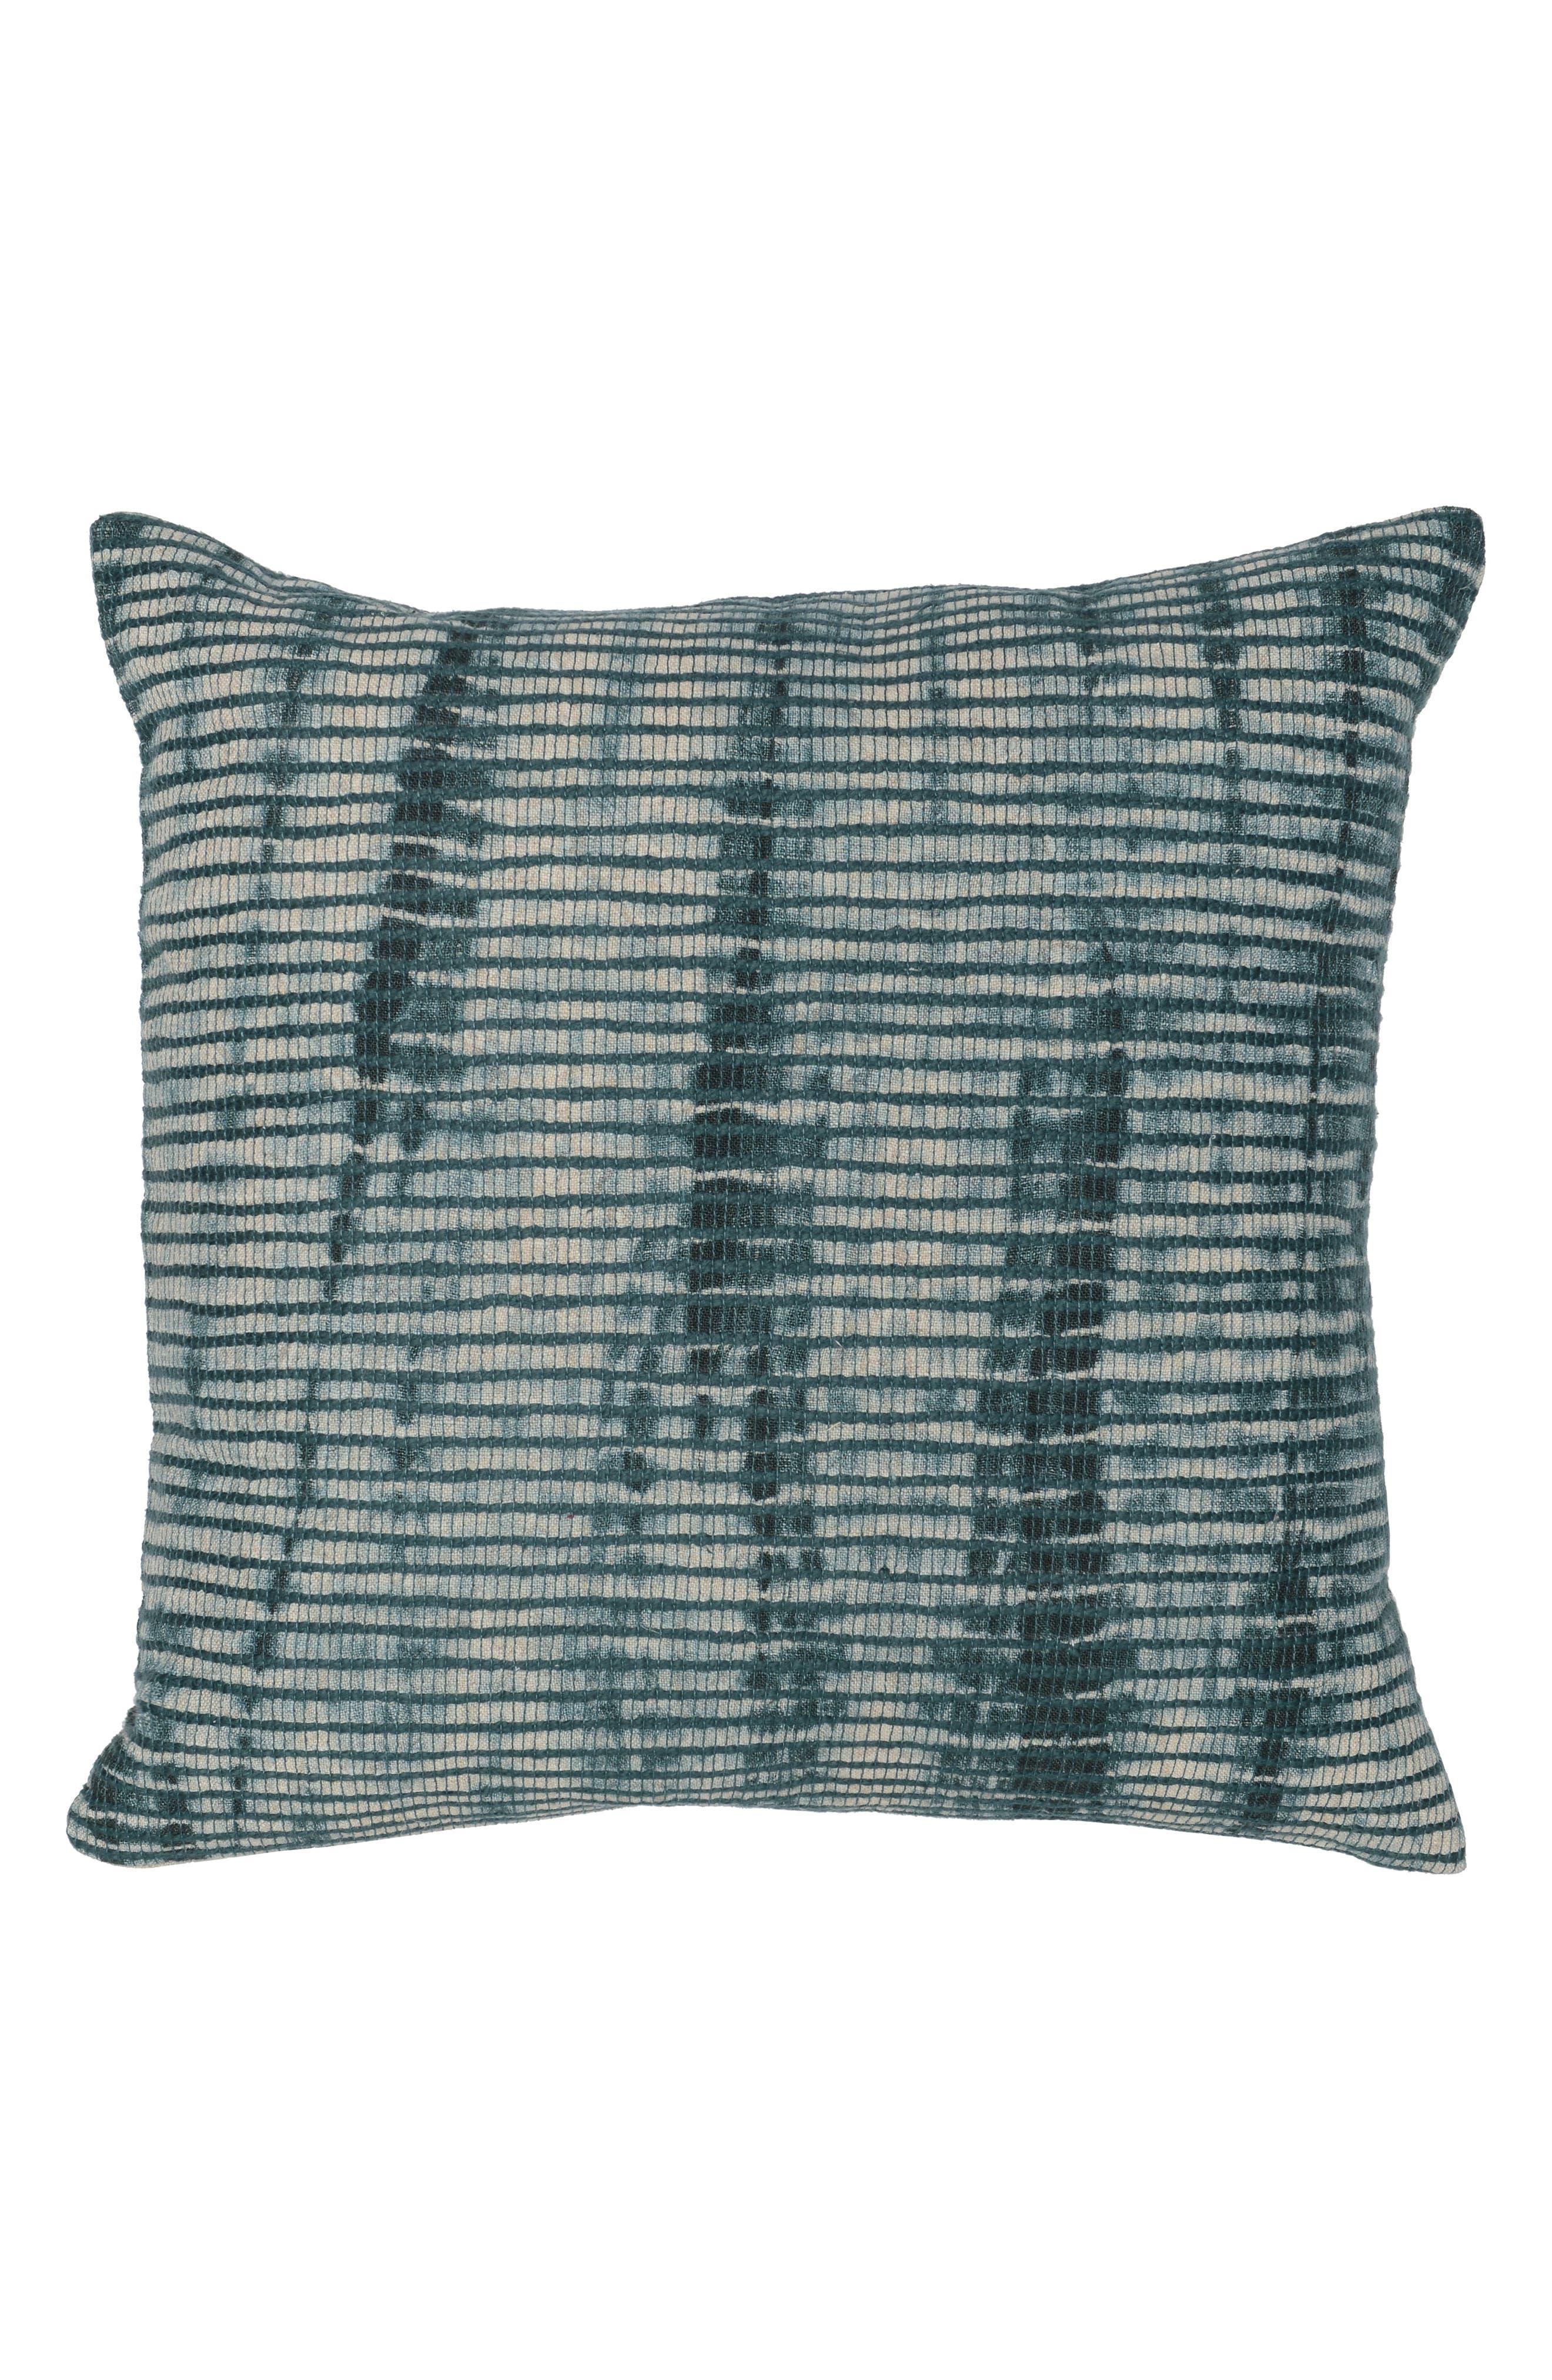 Alternate Image 1 Selected - Villa Home Collection Marni Pillow